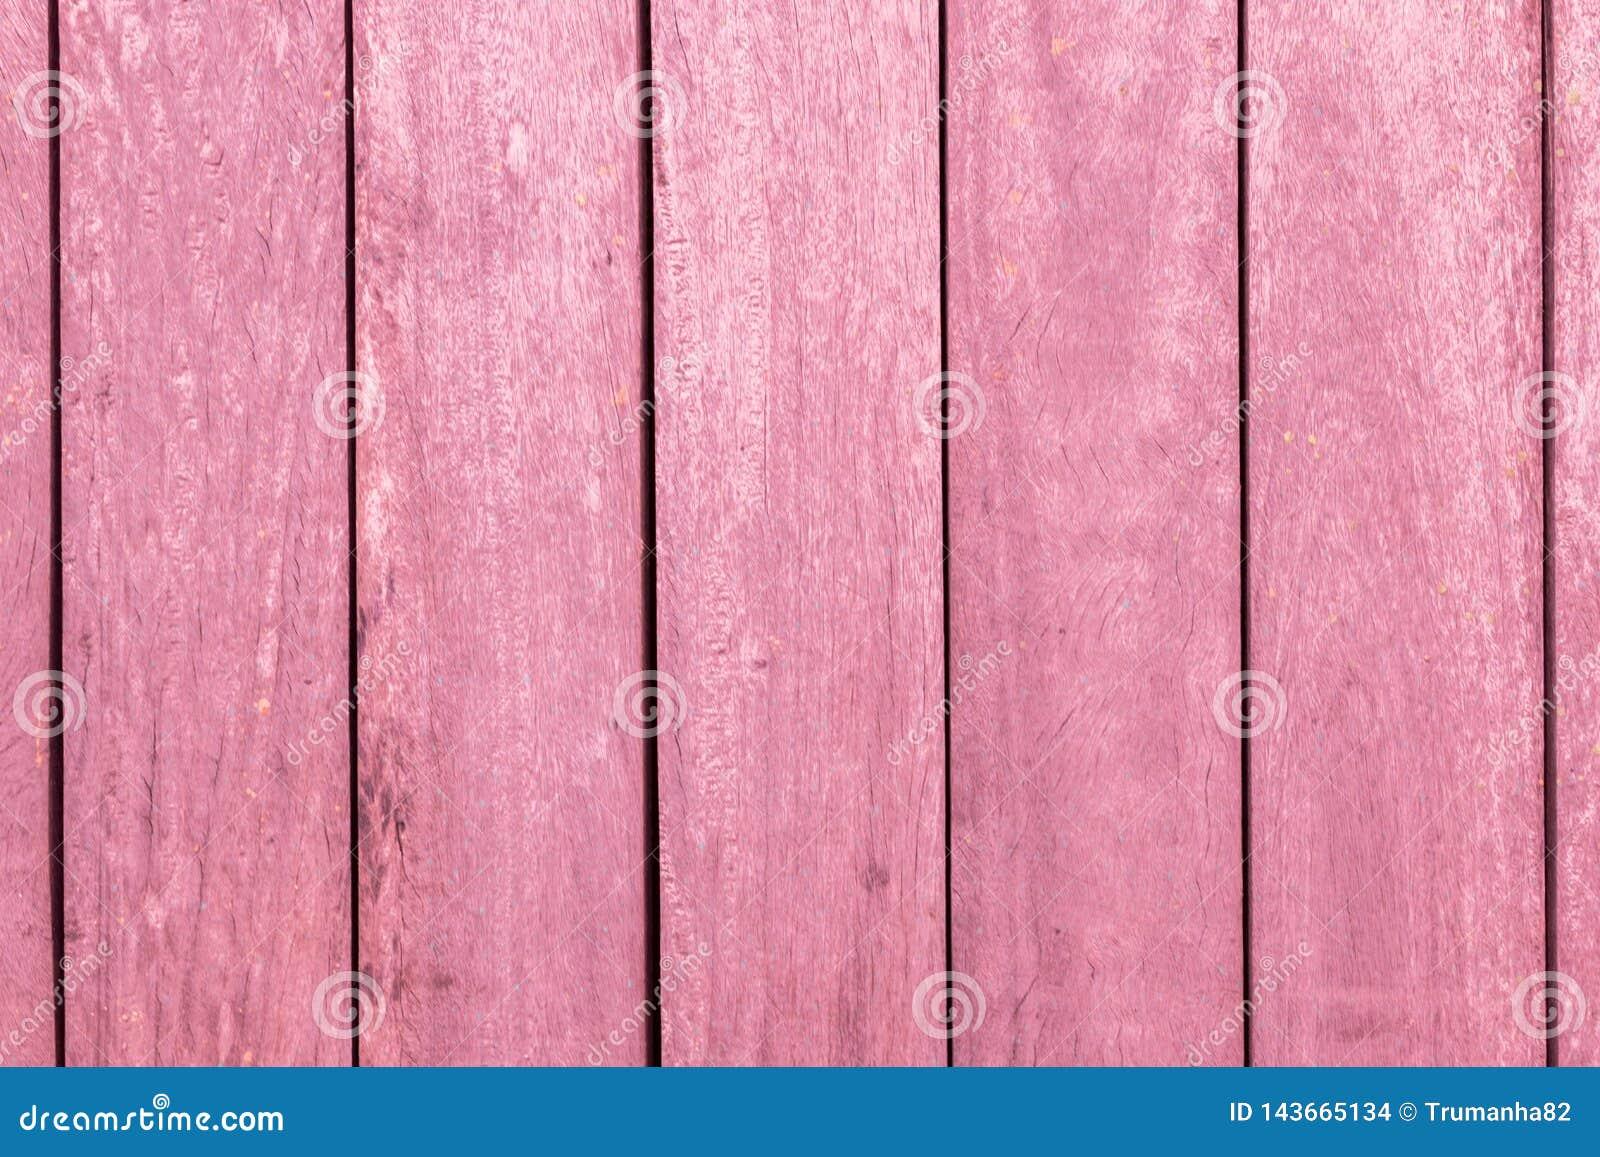 Vertical Pink Wooden Bars Texture Background